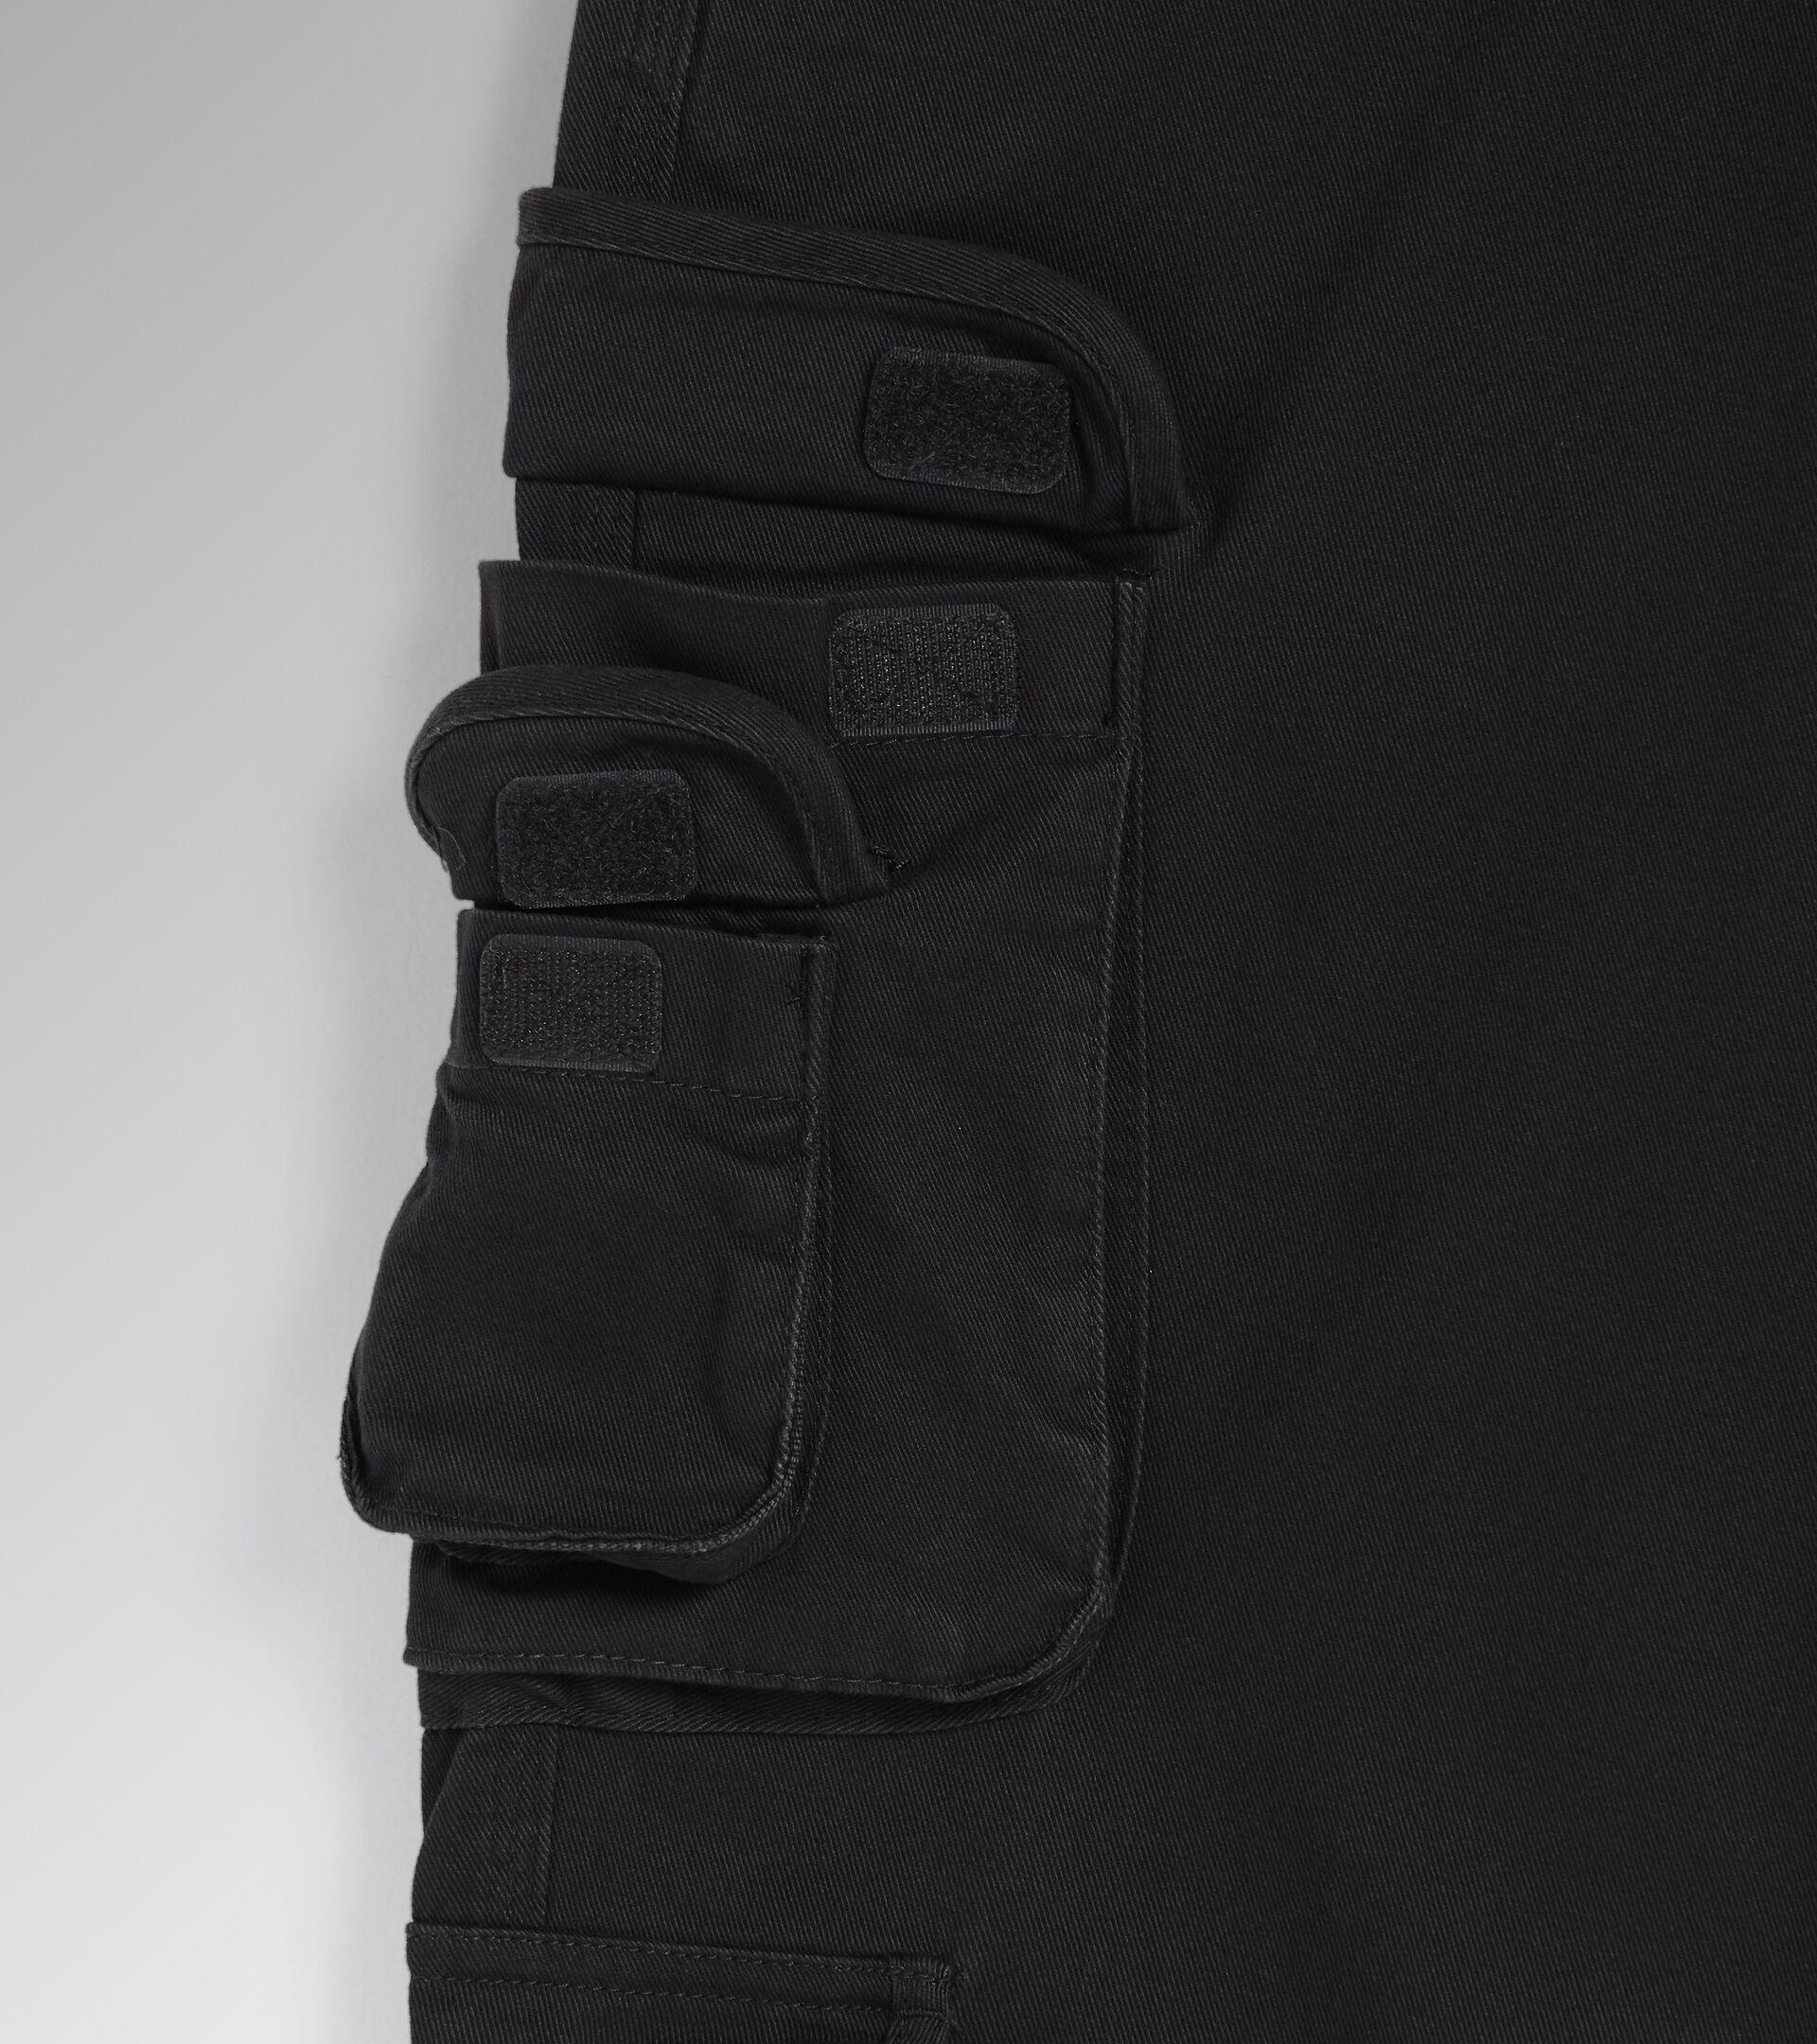 Apparel Utility UOMO PANT WAYET CARGO BLACK Utility